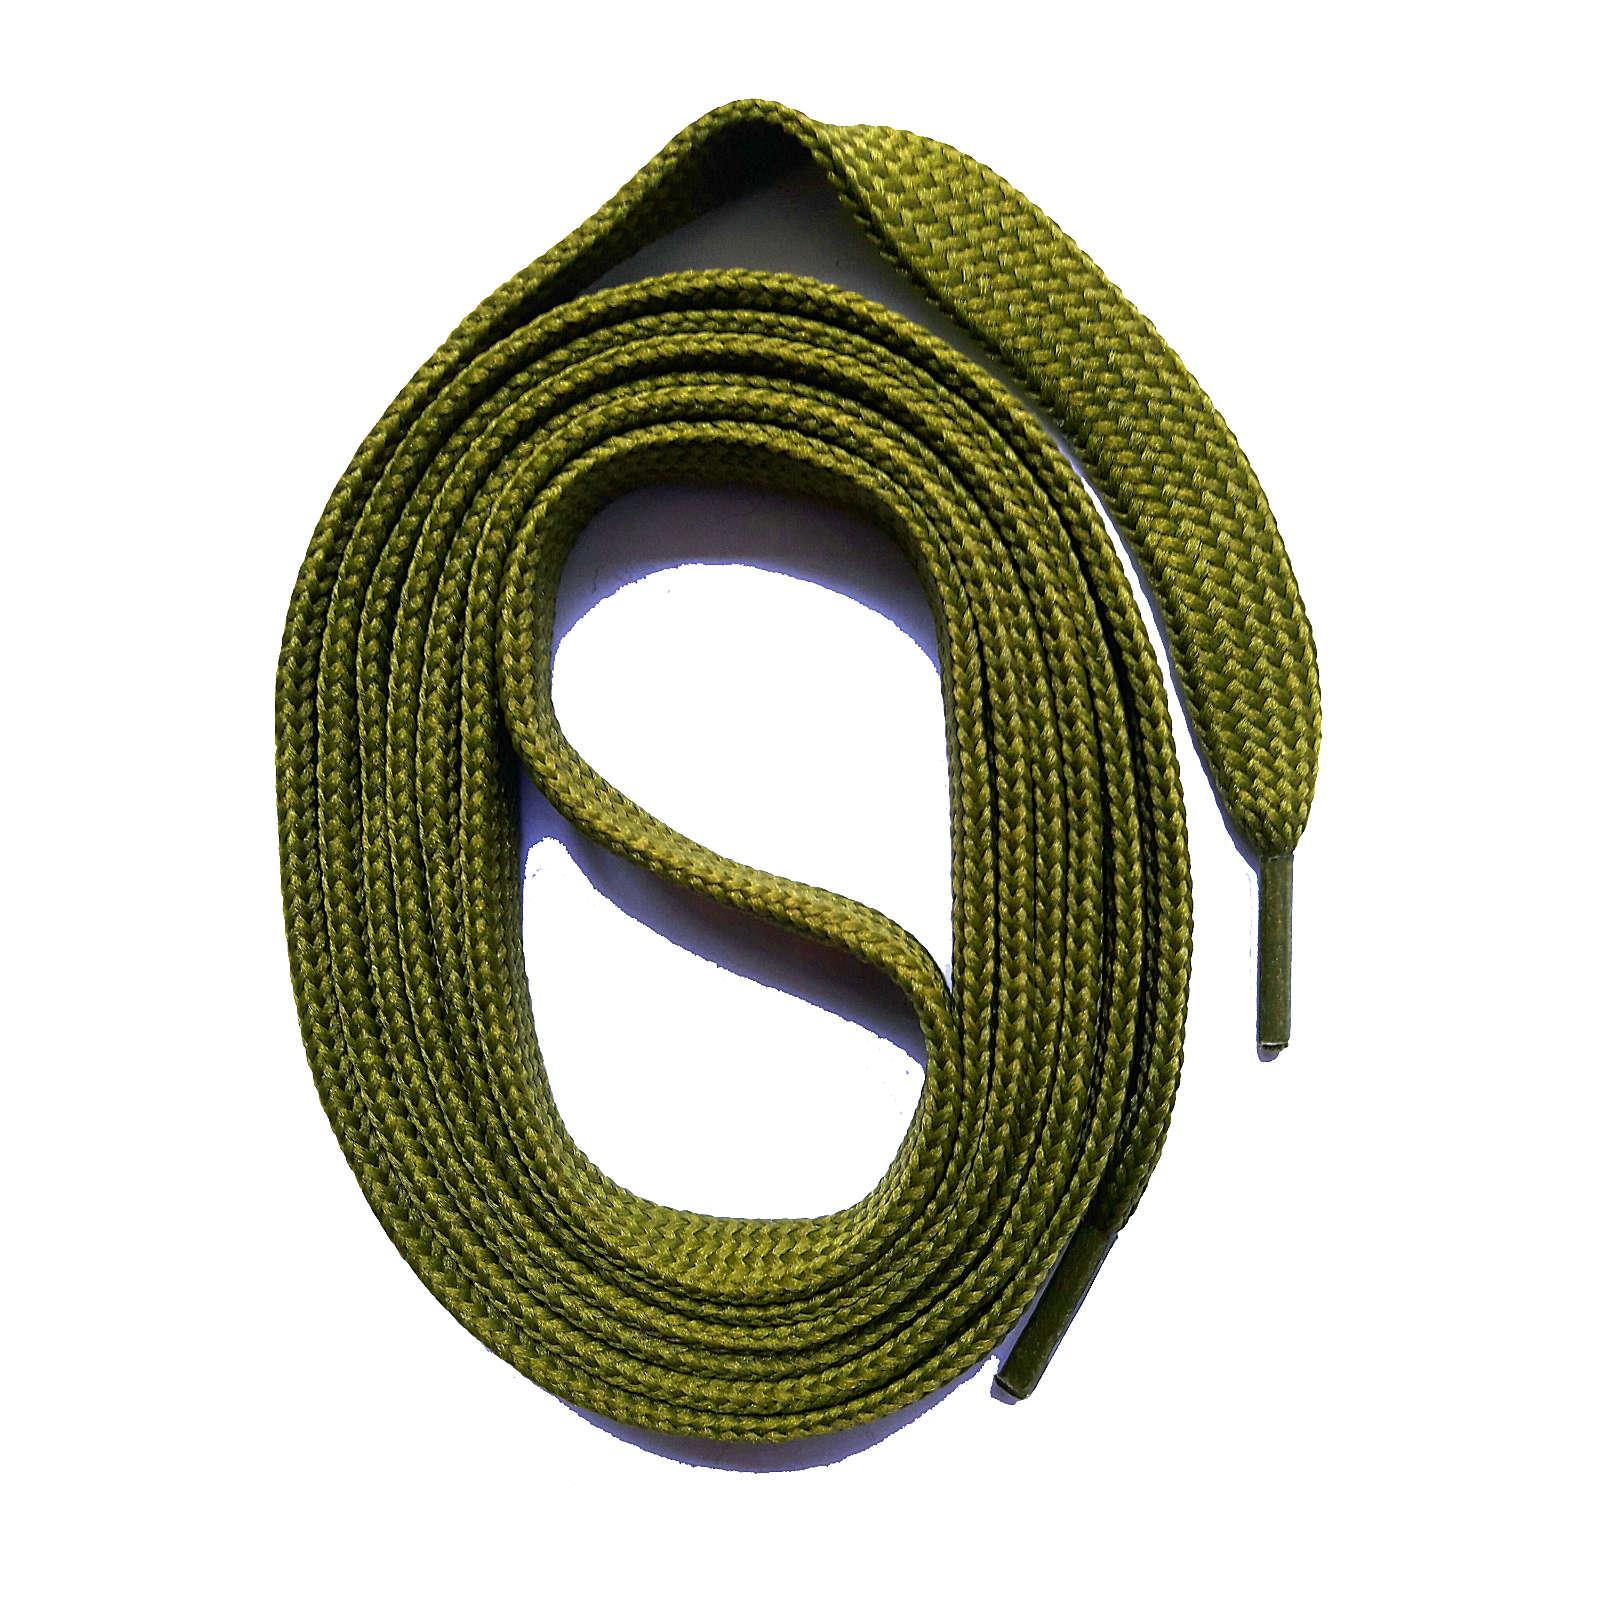 SNORS shoefriends SNORS Schnürsenkel flach 60-240cm, 7mm aus Polyester Schnürsenkel khaki Gr. 240